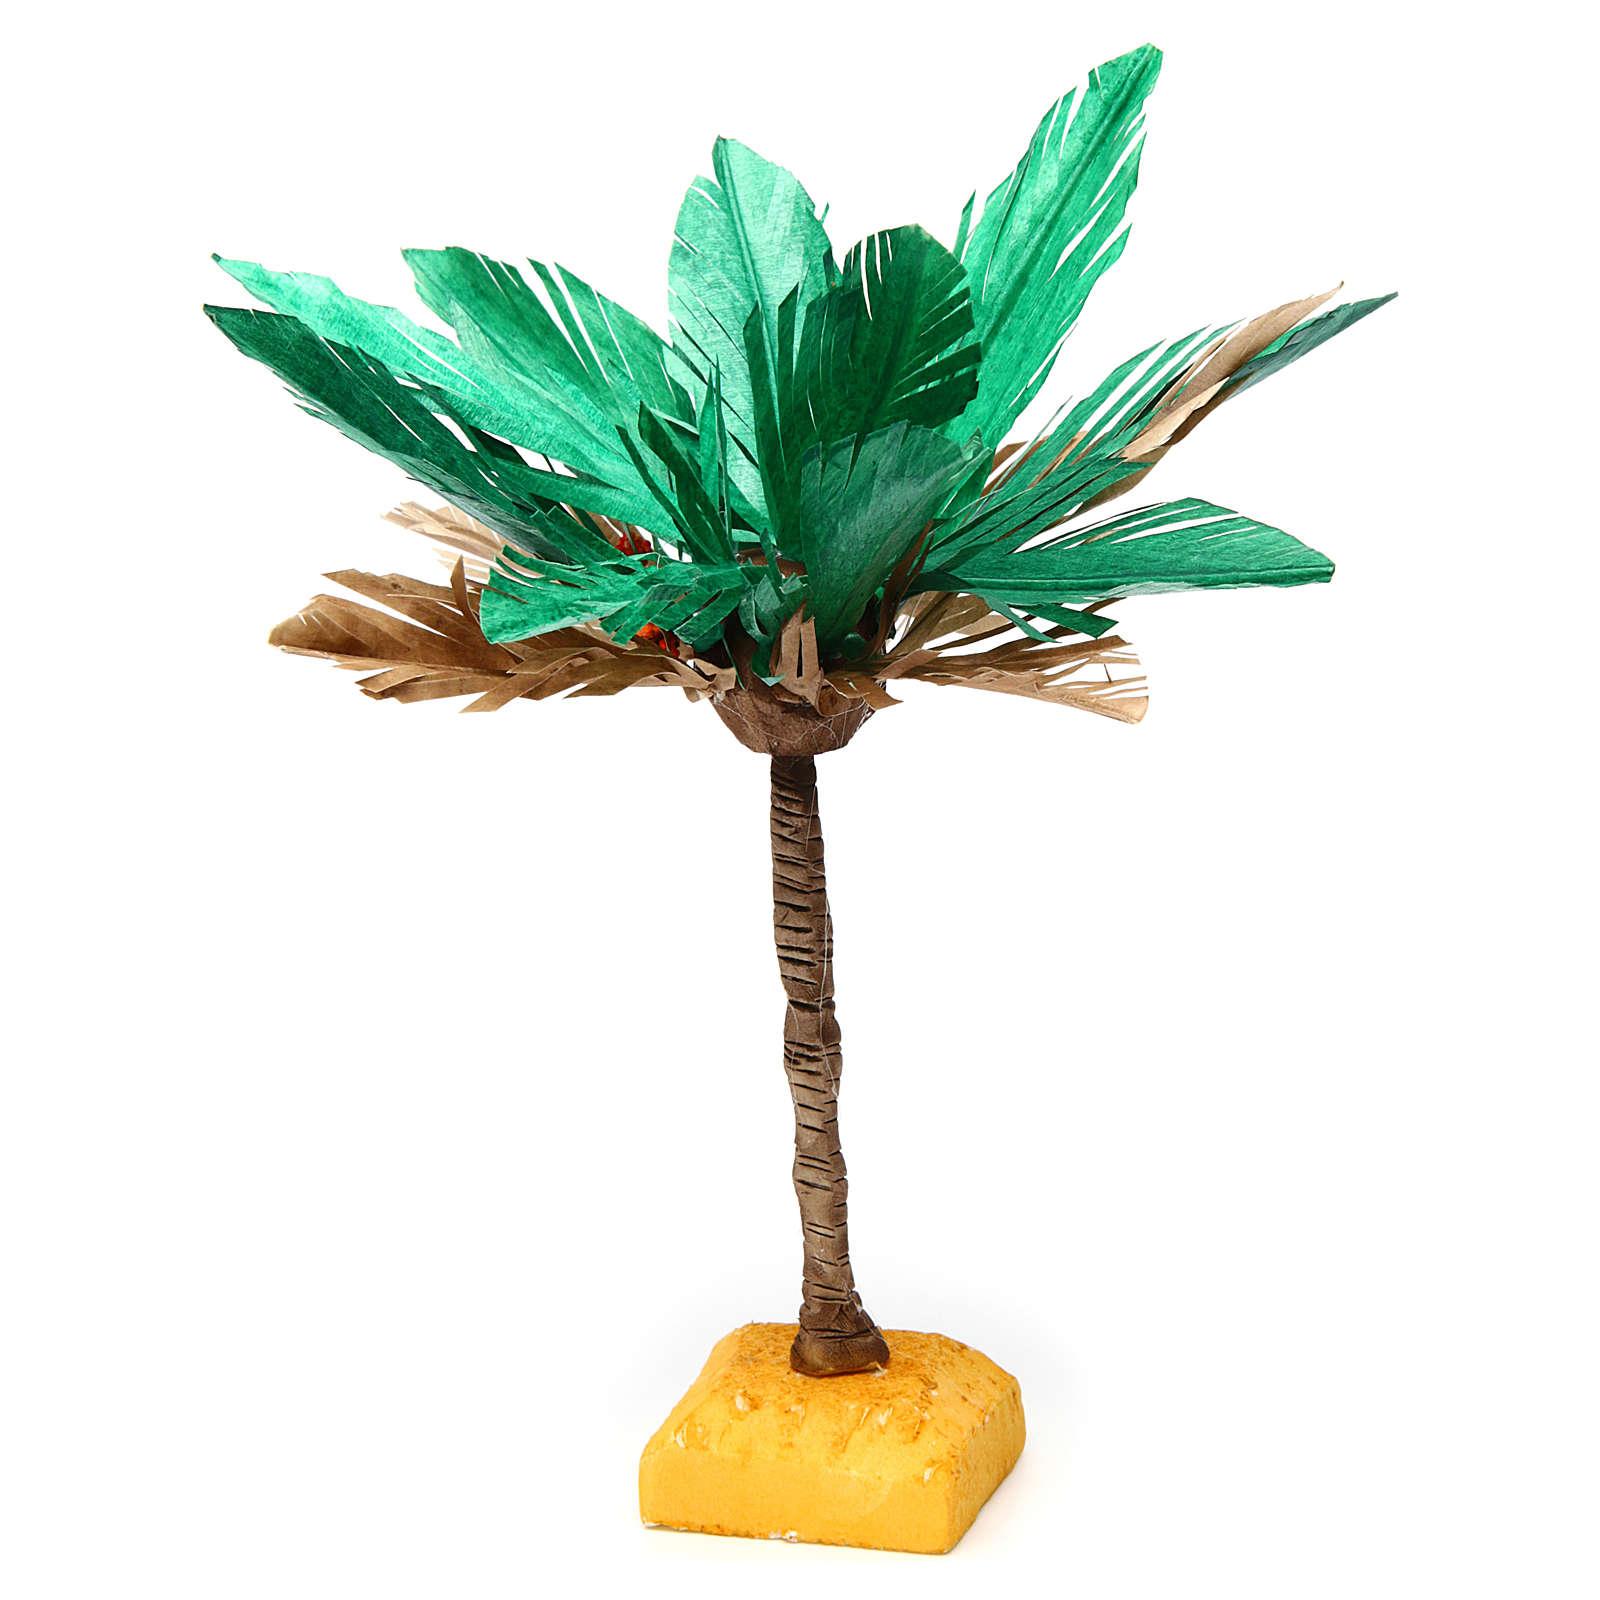 Palma bicolore per presepe 20x10 cm 4